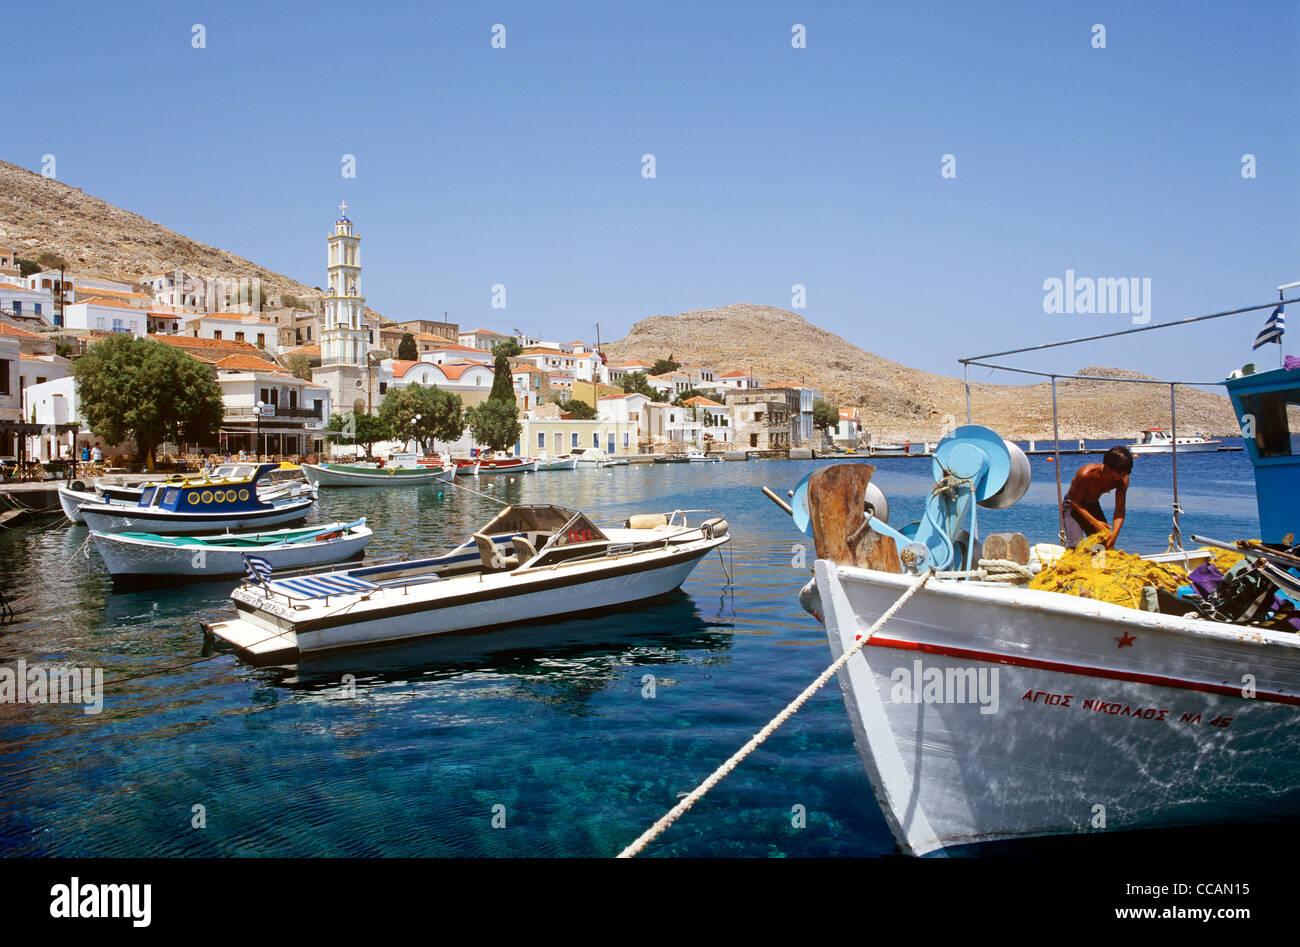 The Harbour Halki Greek Islands Greece - Stock Image